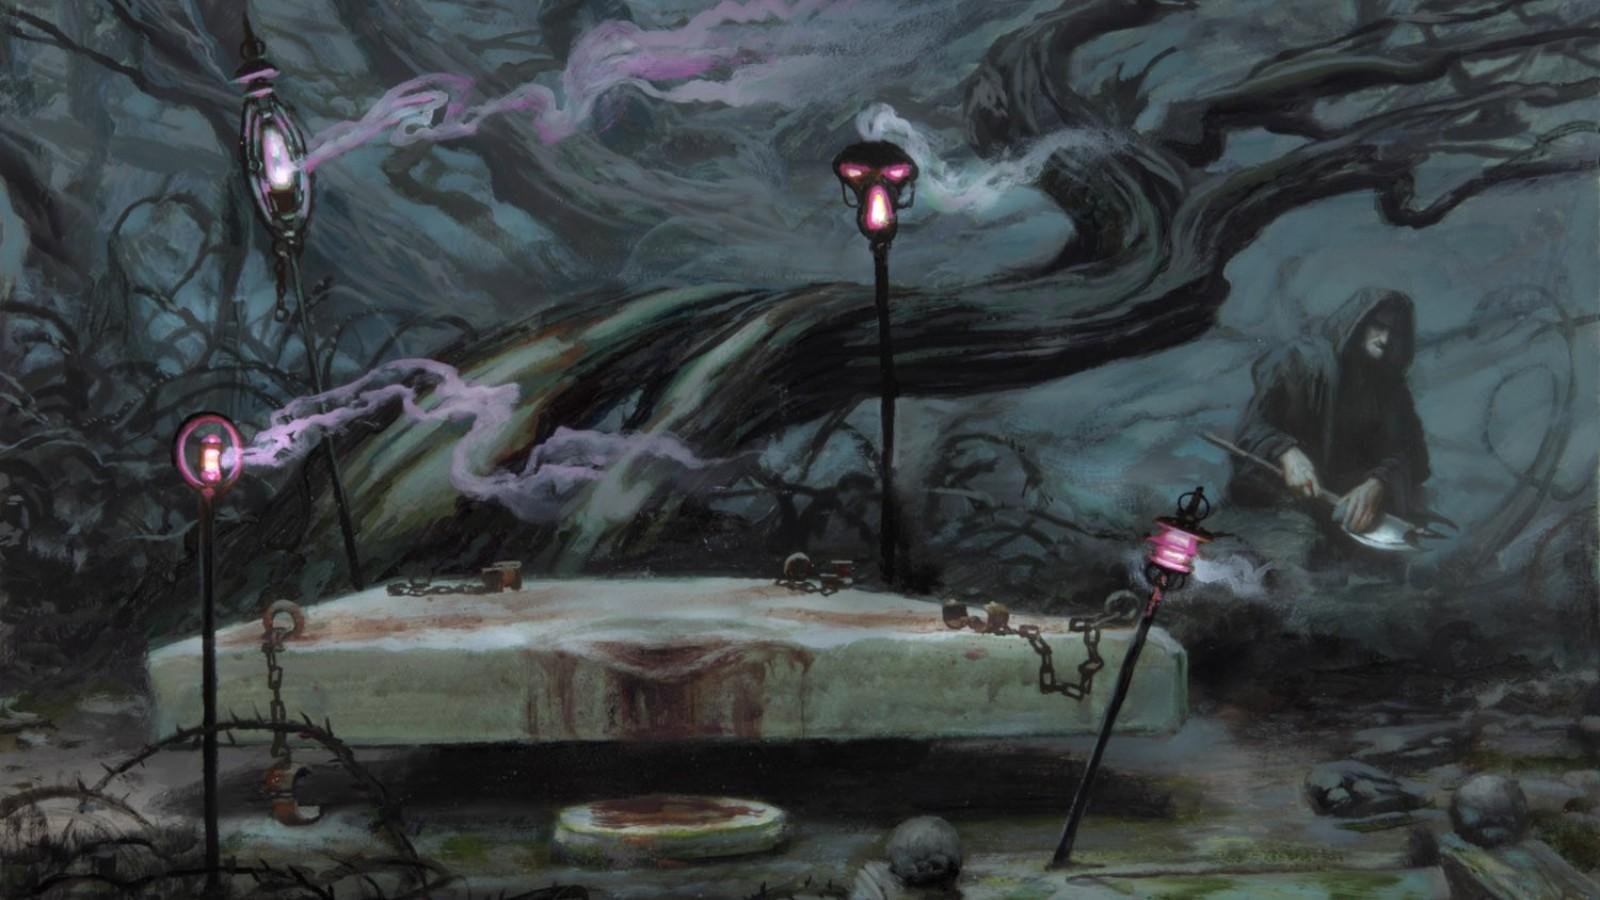 Download Floor Plans Gathering Fantasy Art Sacrifice Altar Donato Giancola Dark